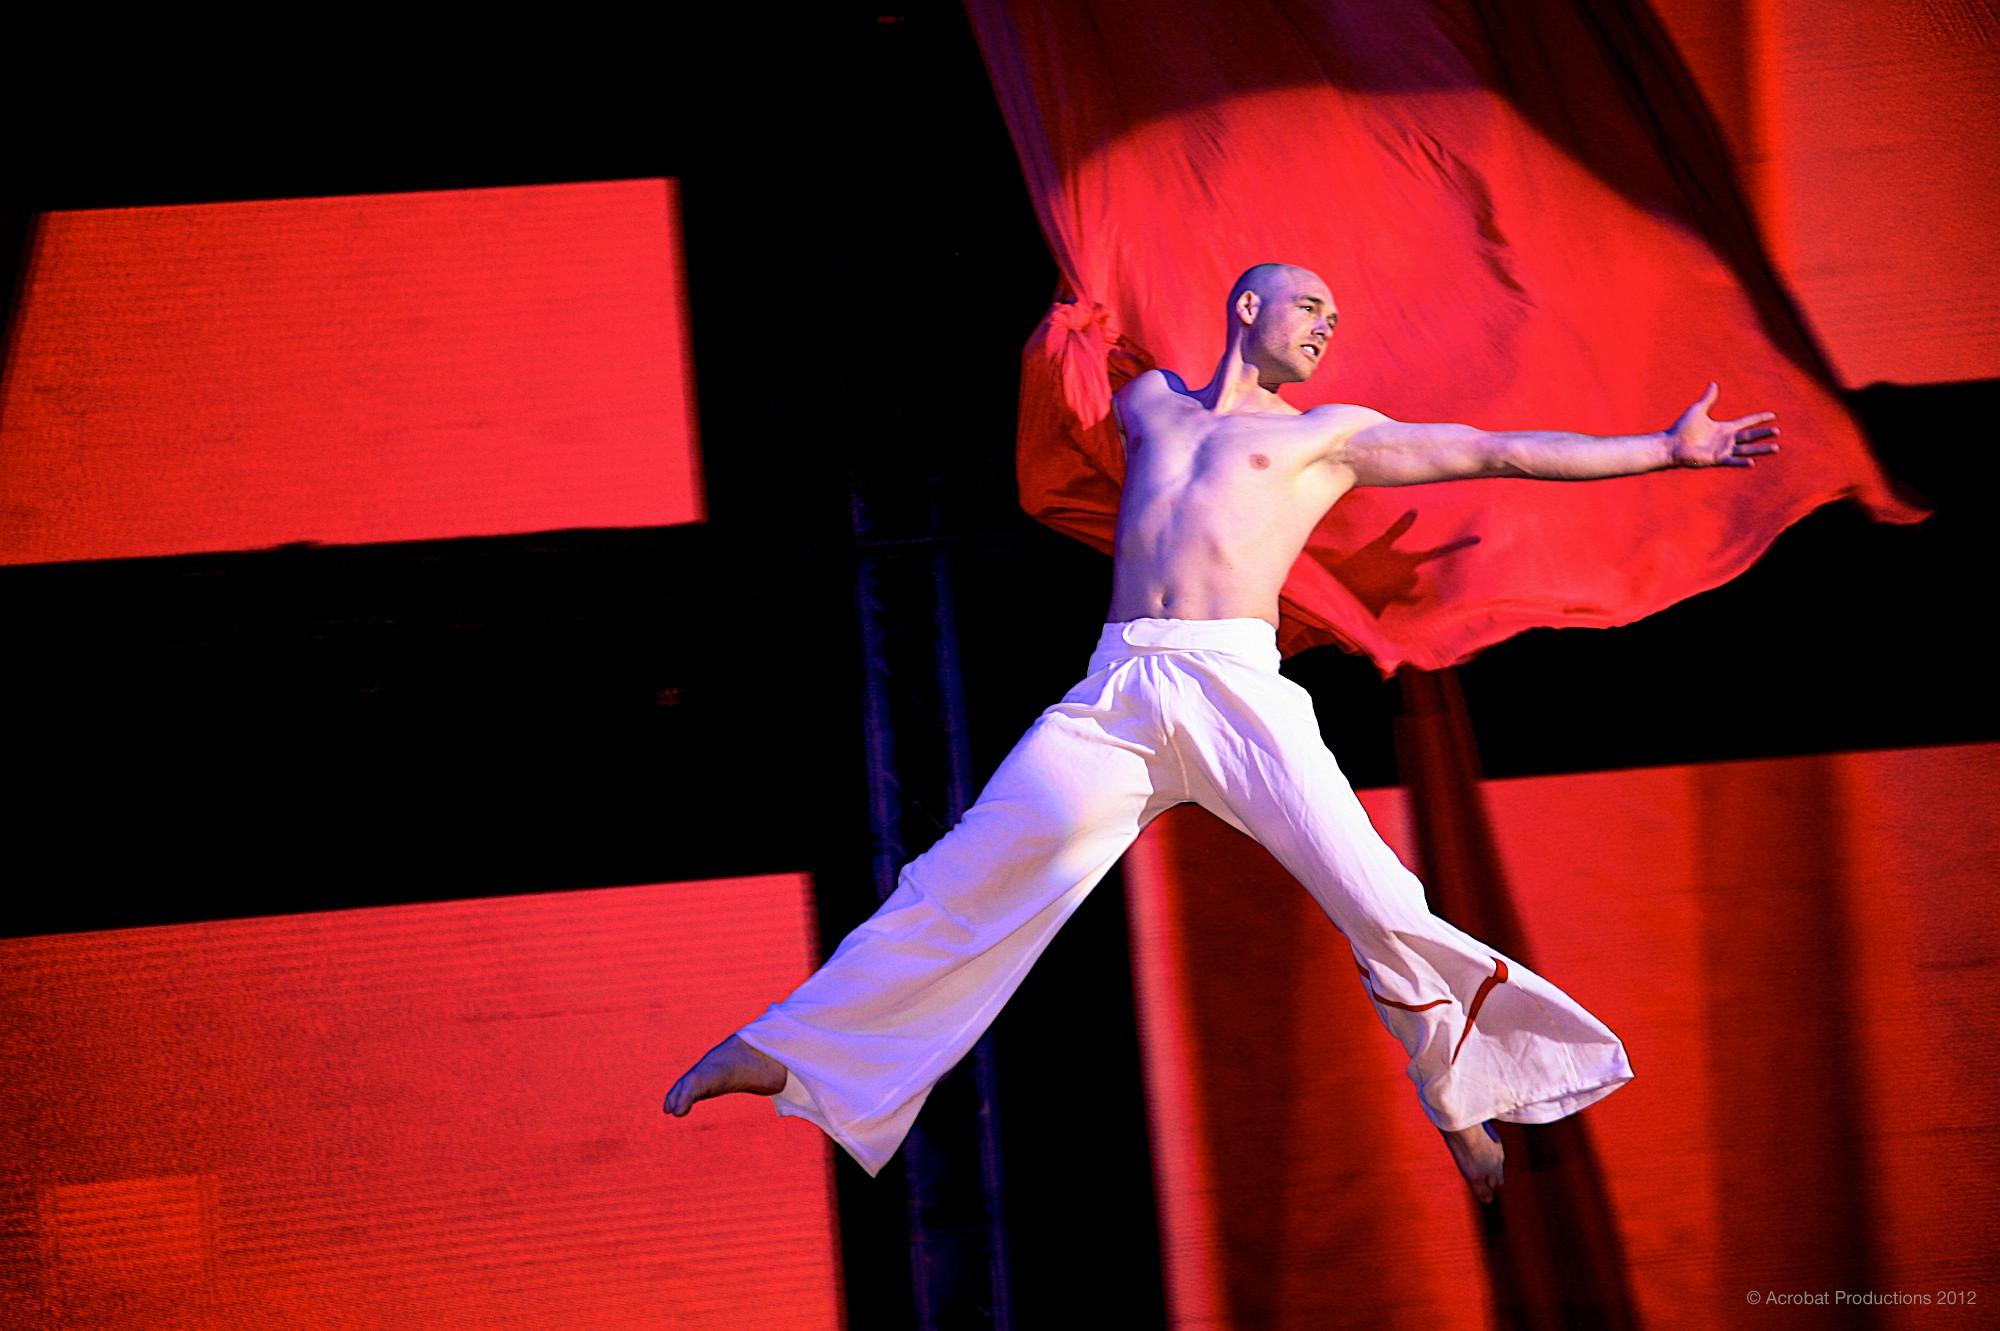 flying-aerial-silks-performer-christian-hunt